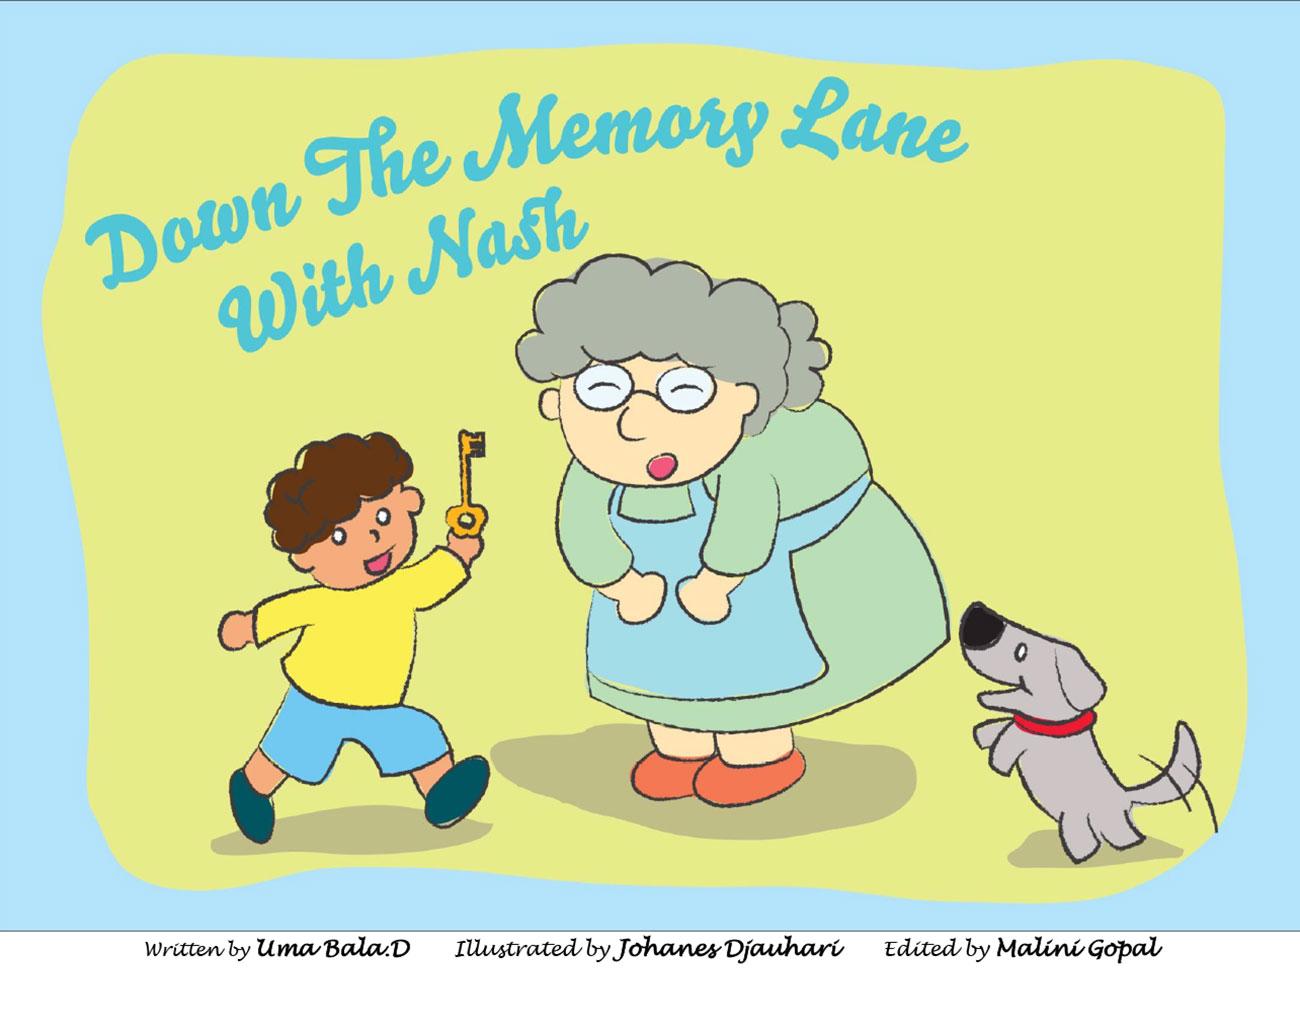 kids short story 'Down the memory lane with nash' by uma bala devarakonda - page 1